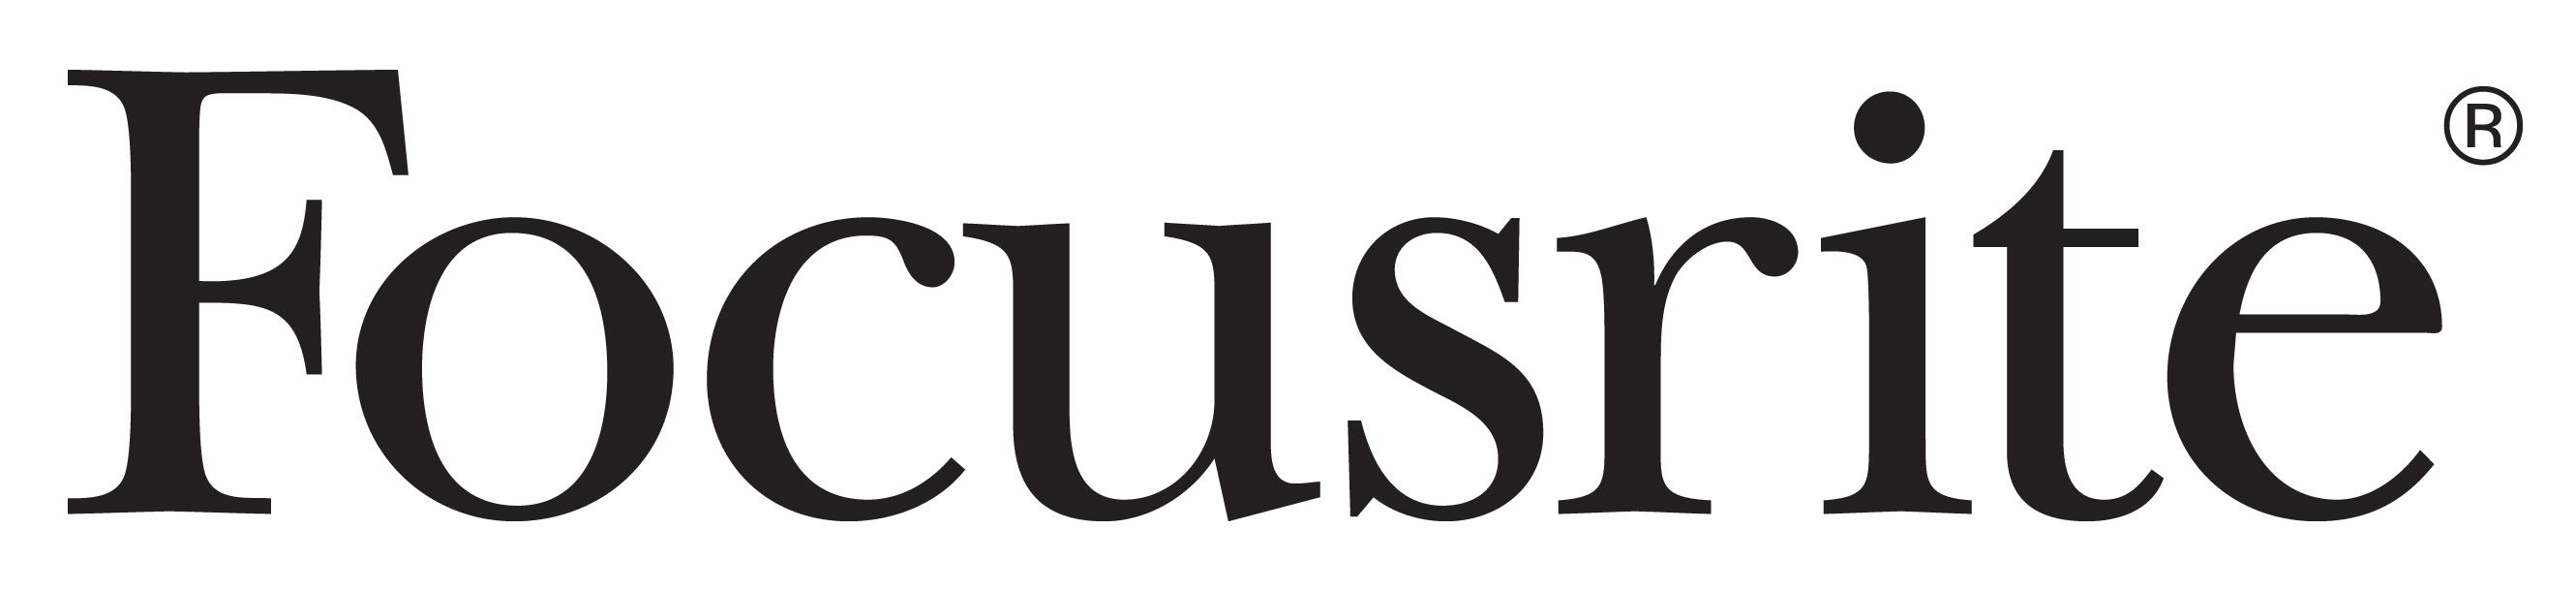 Focusrite logo large